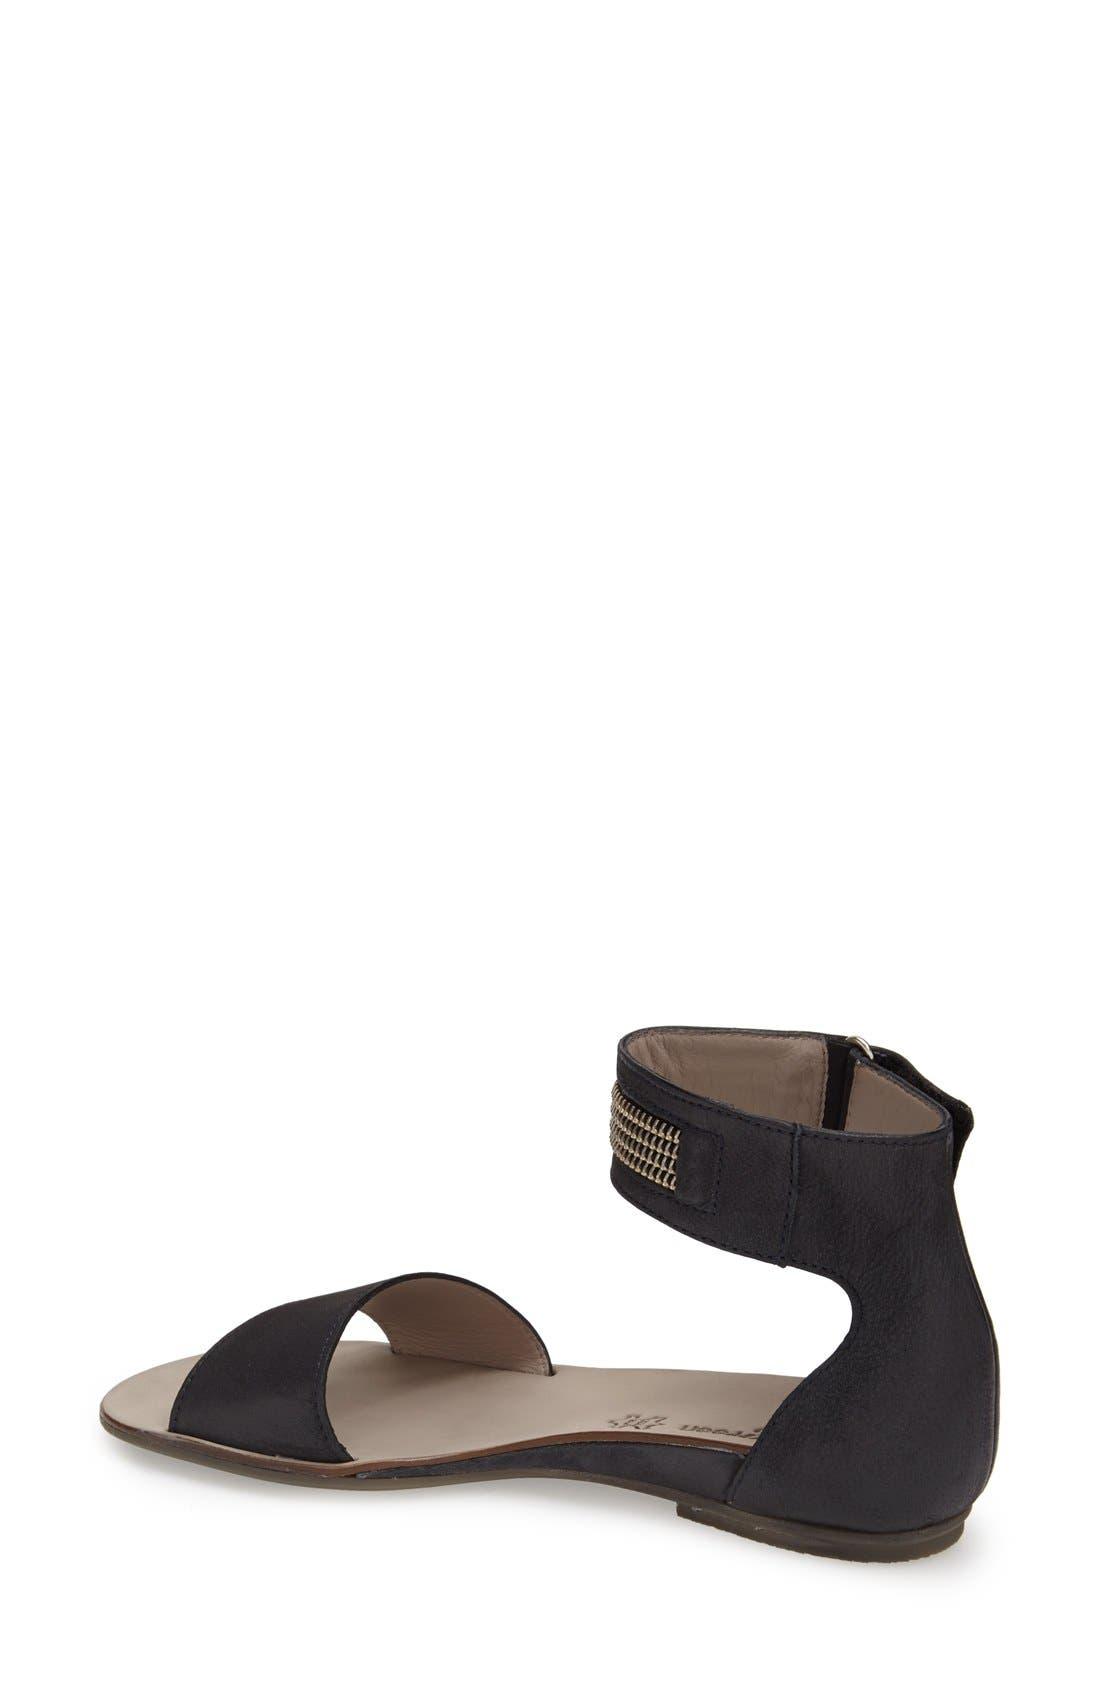 Alternate Image 2  - Paul Green 'Cotie' Ankle Strap Flat Sandal (Women)